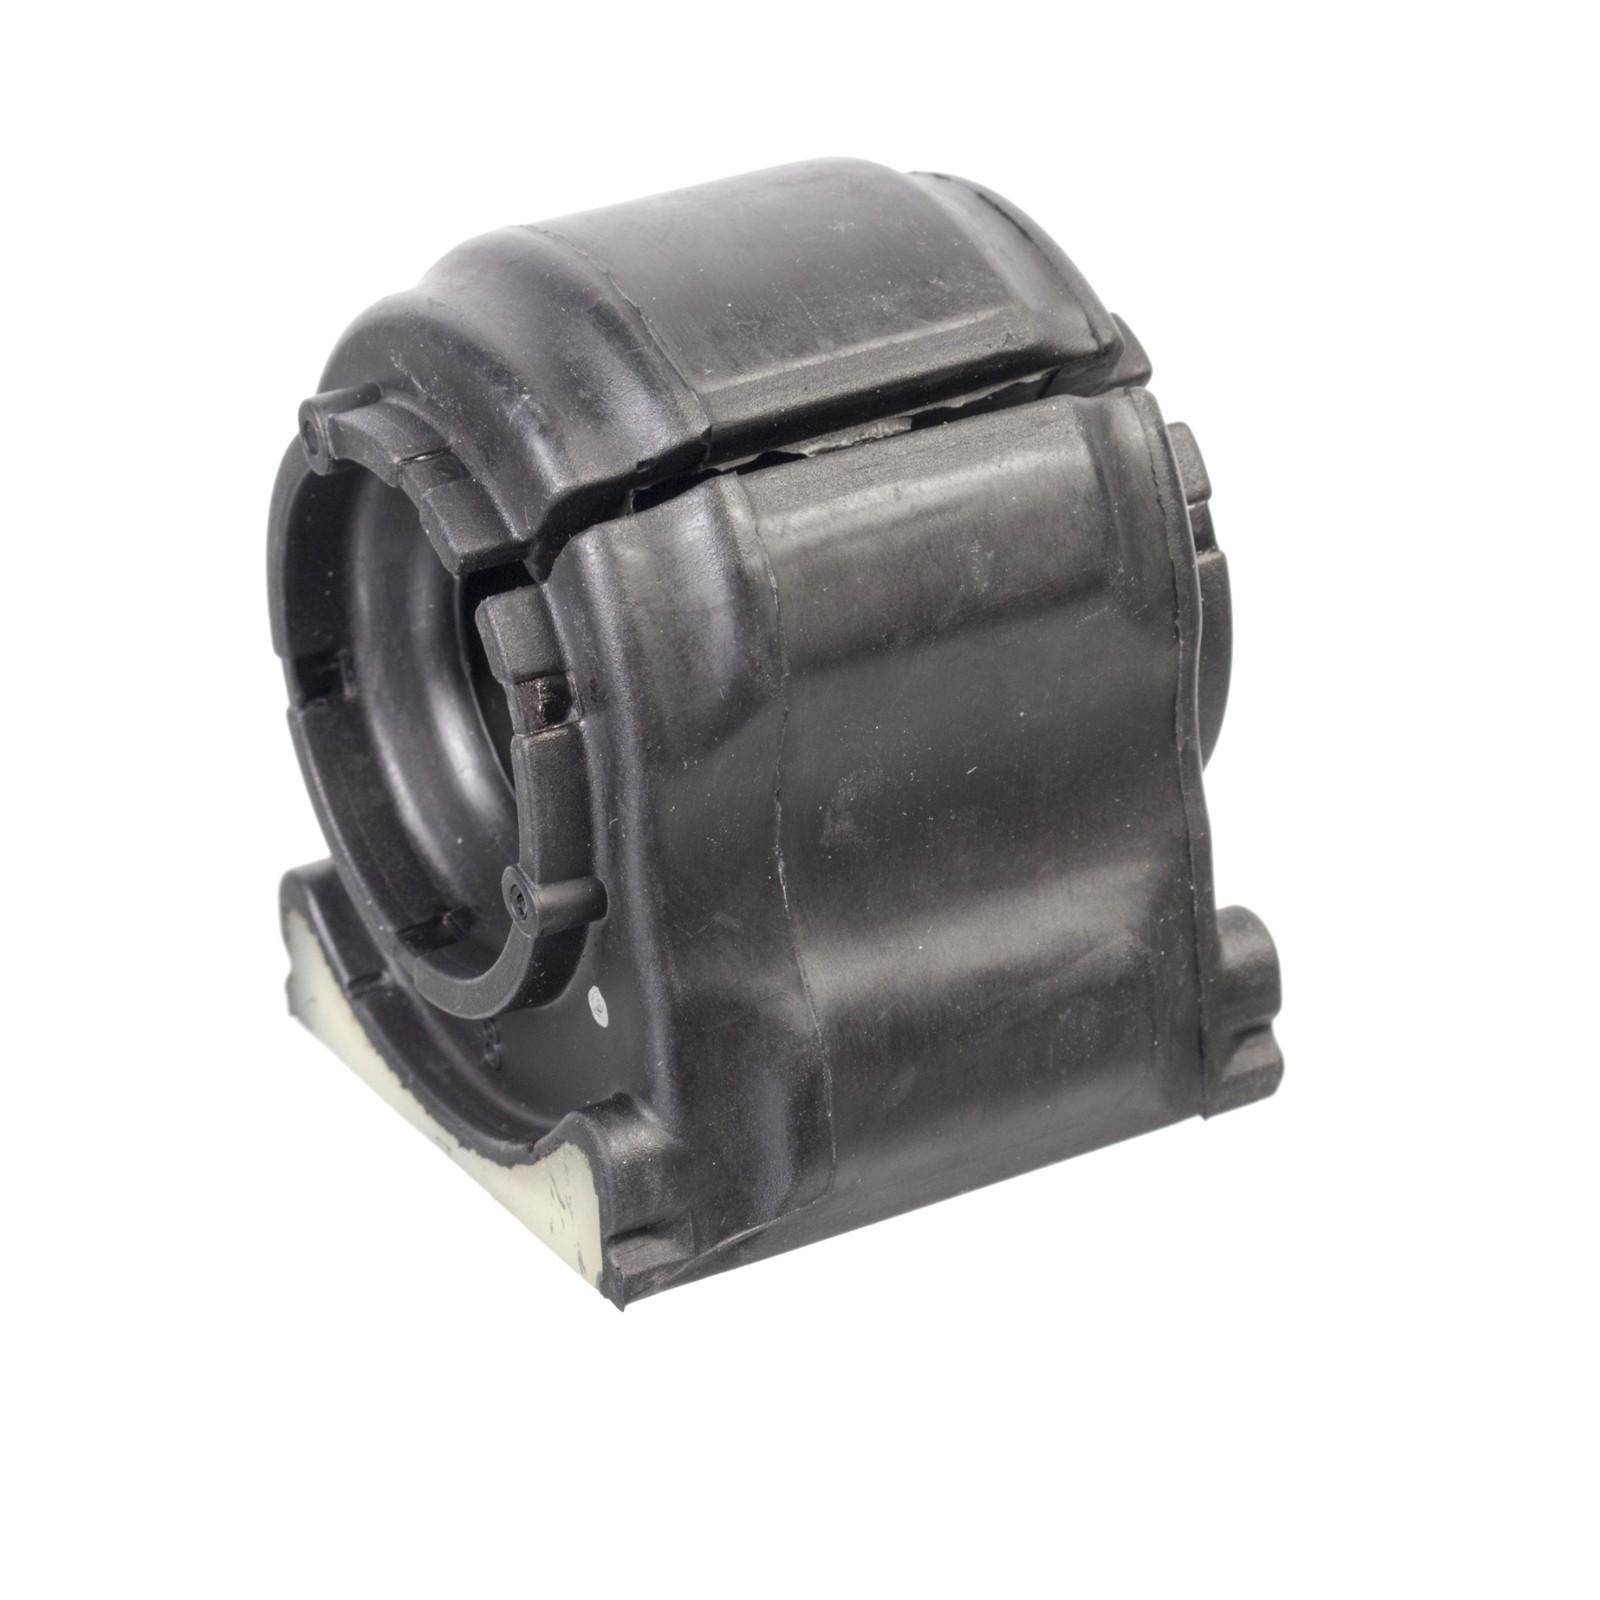 2x FEBI 108043 Stabilisatorlager MERCEDES Sprinter (906) hinten 9063262381